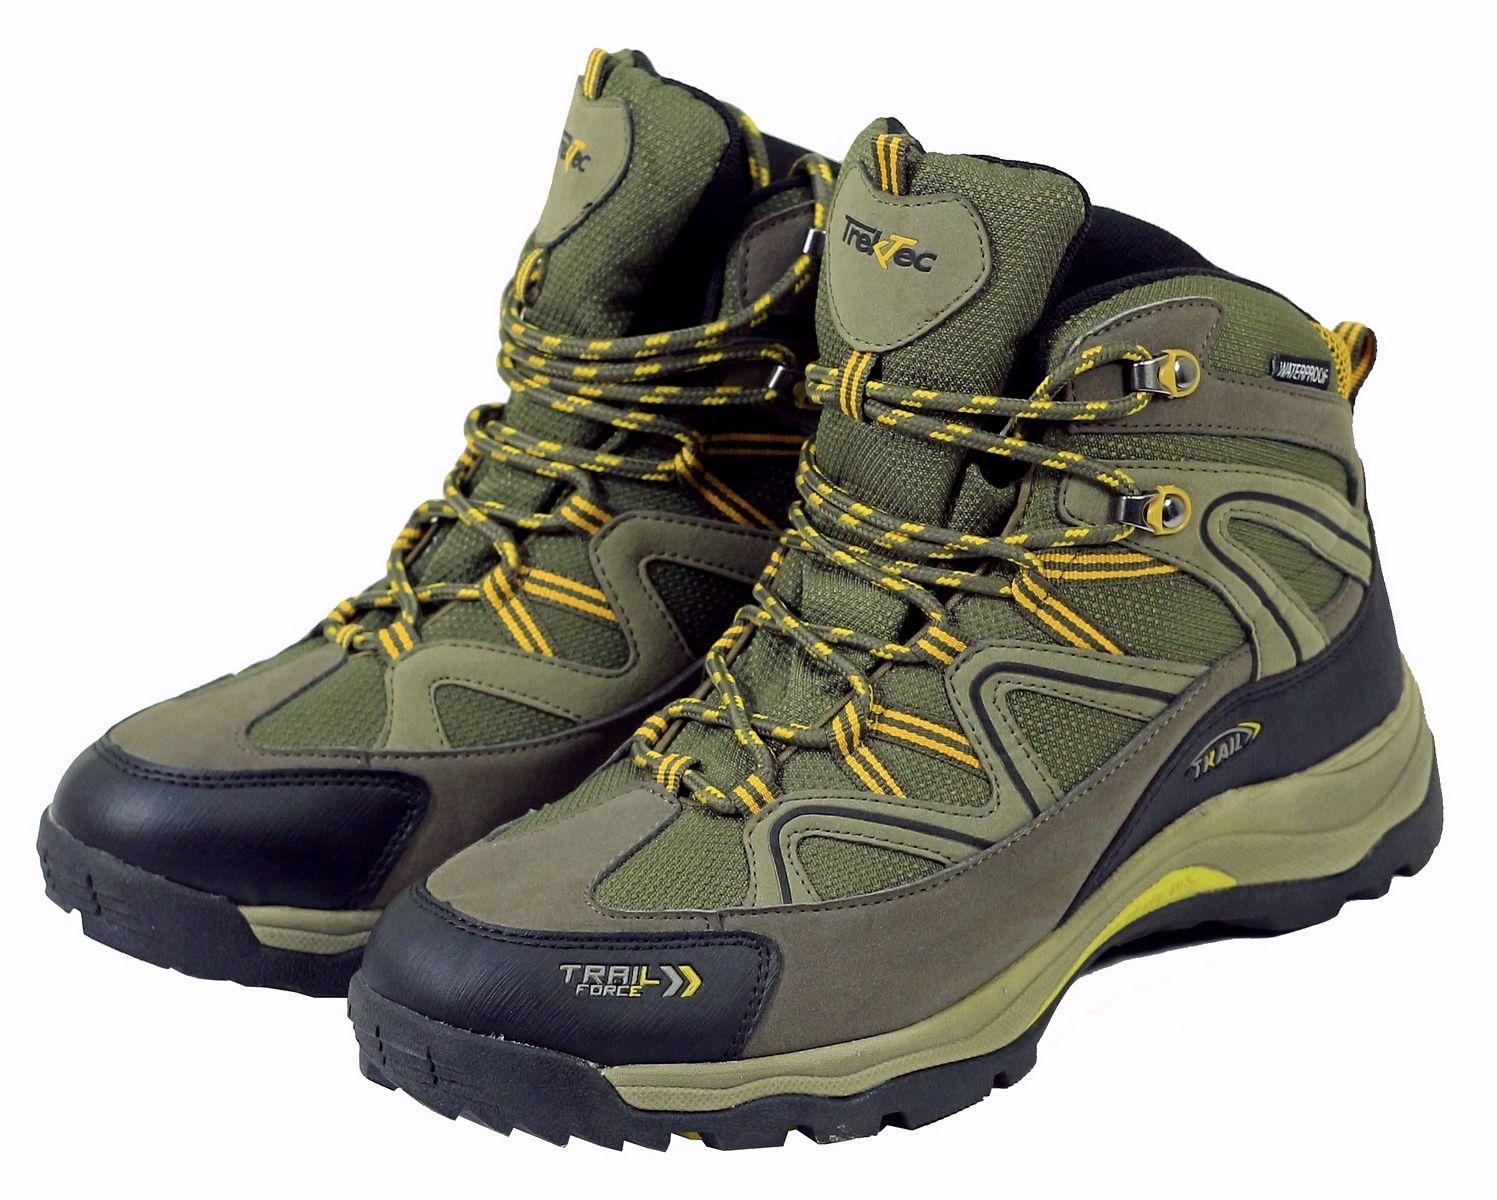 a5491dc6f54c Ботинки Trail Force бренд  TrekTec Military Fashion